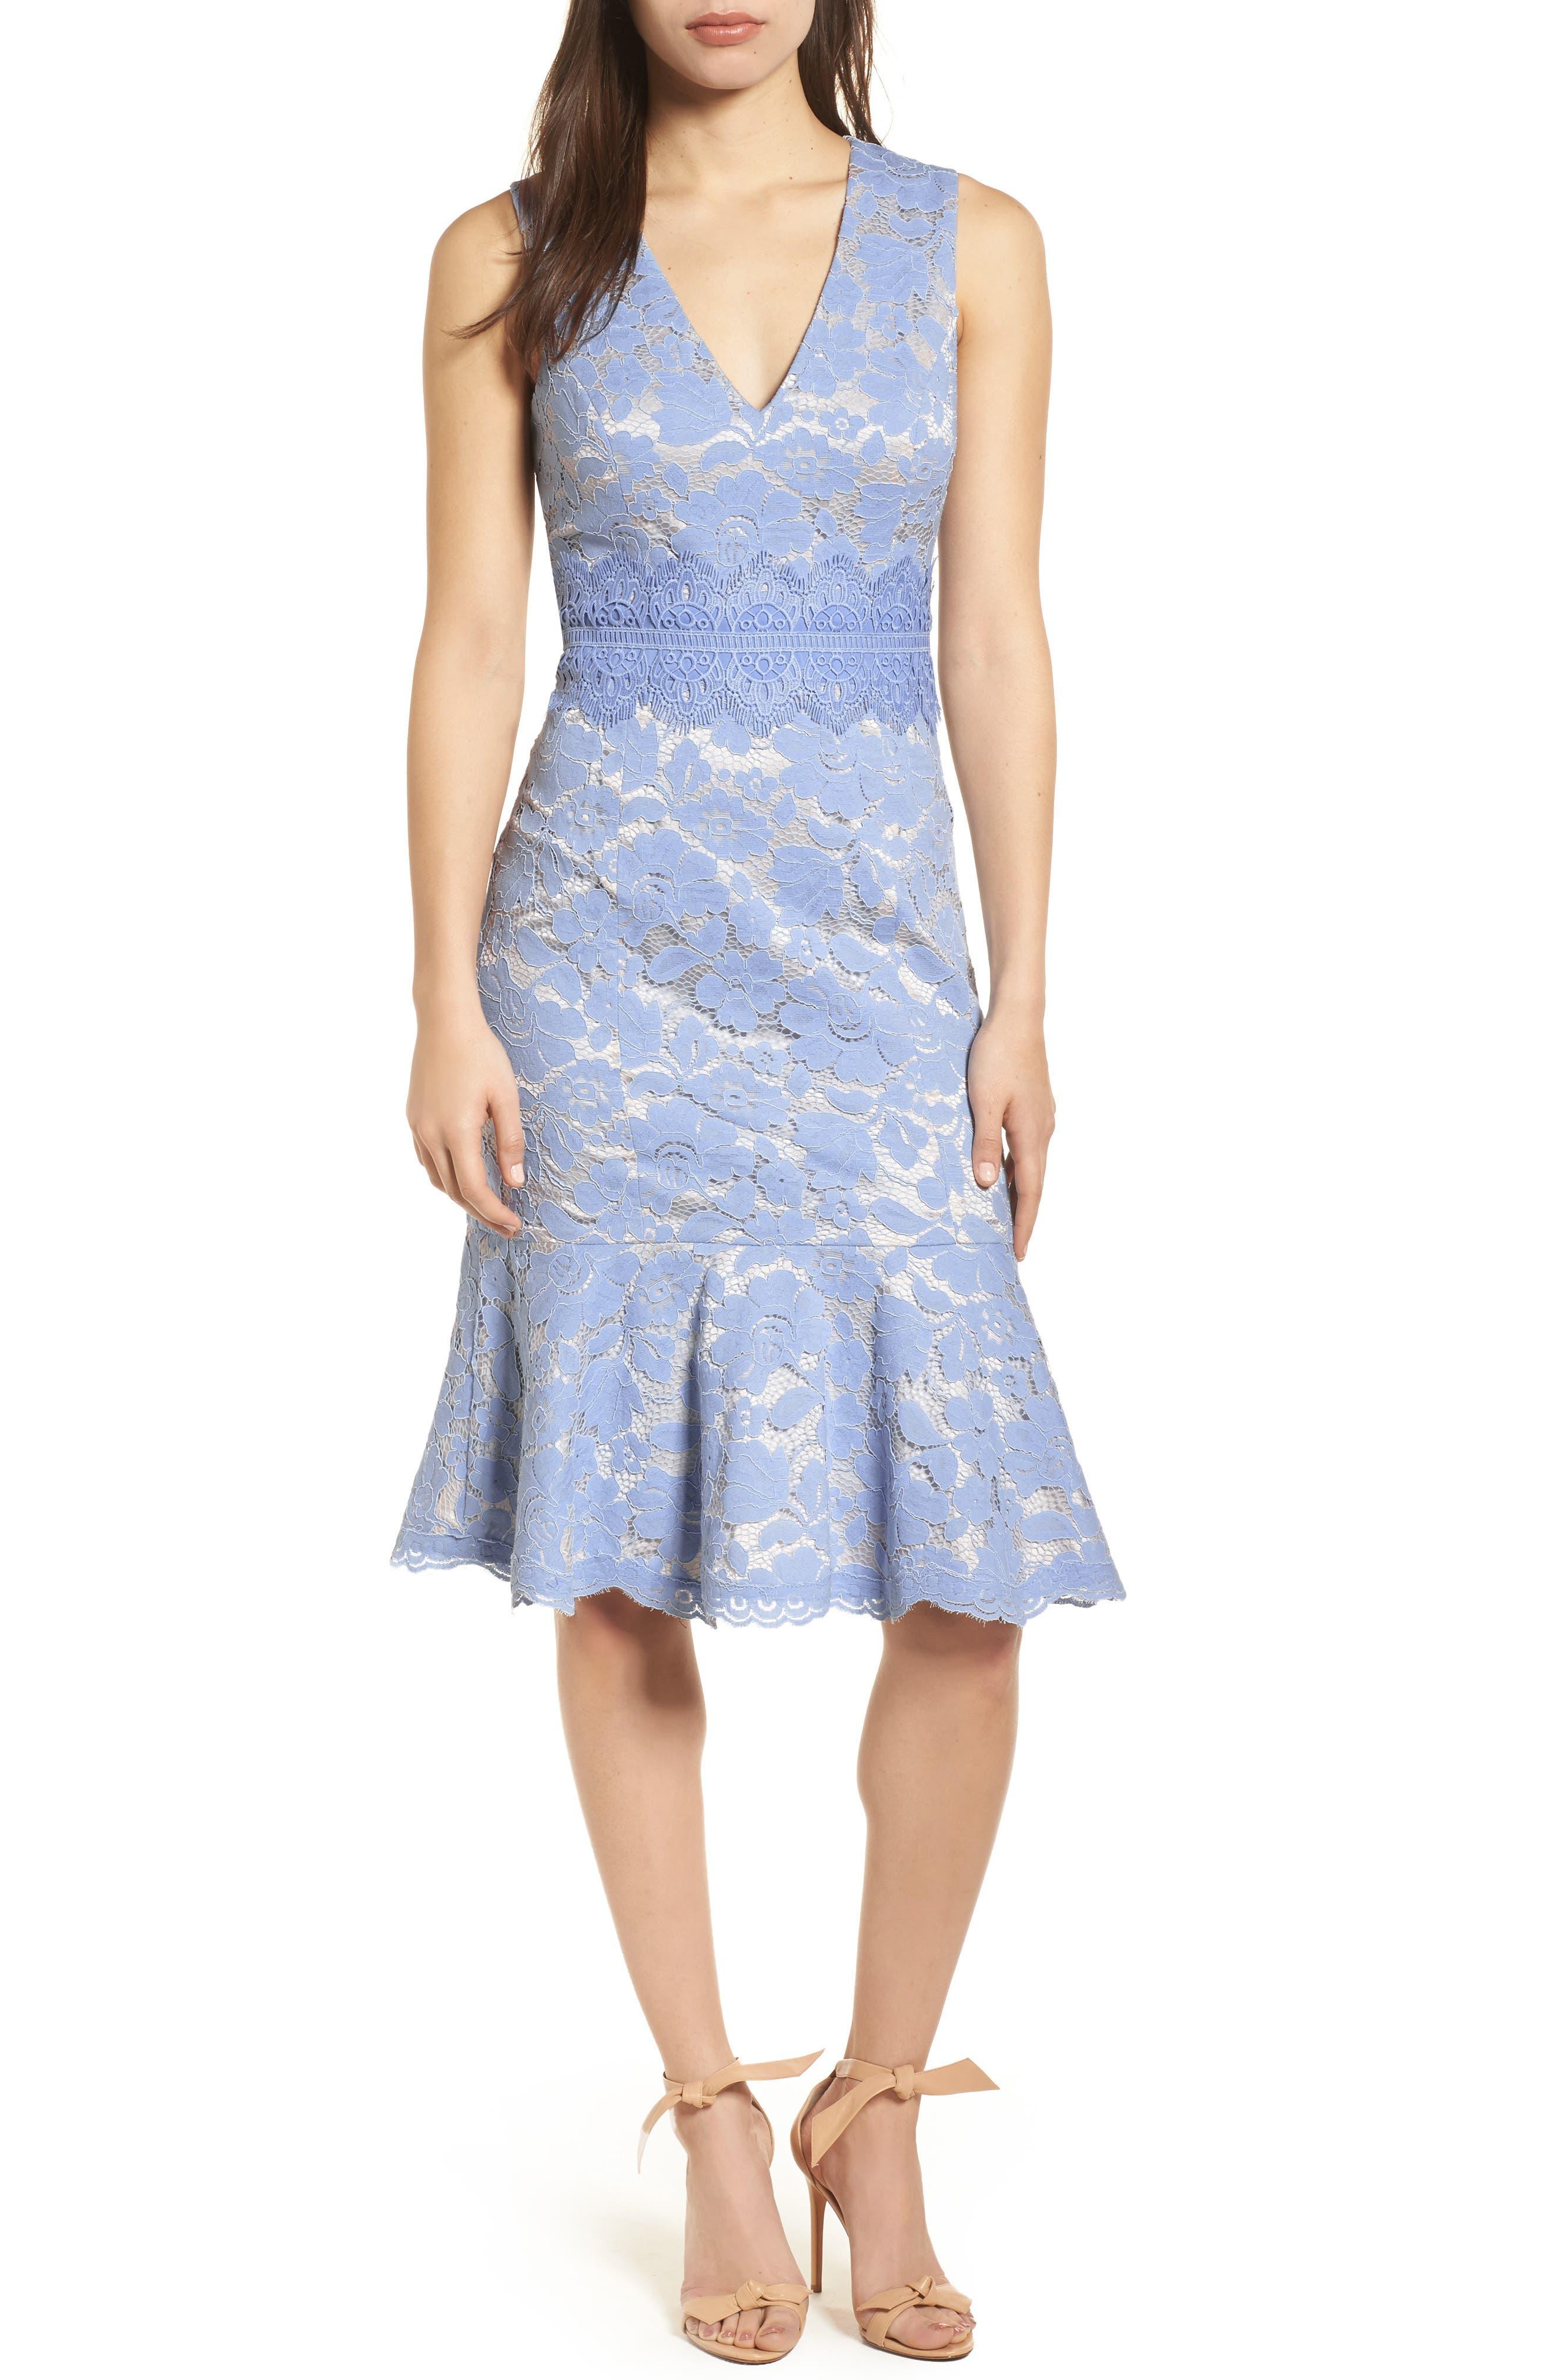 Alternate Image 1 Selected - Vince Camuto Lace Sheath Dress (Regular & Petite)